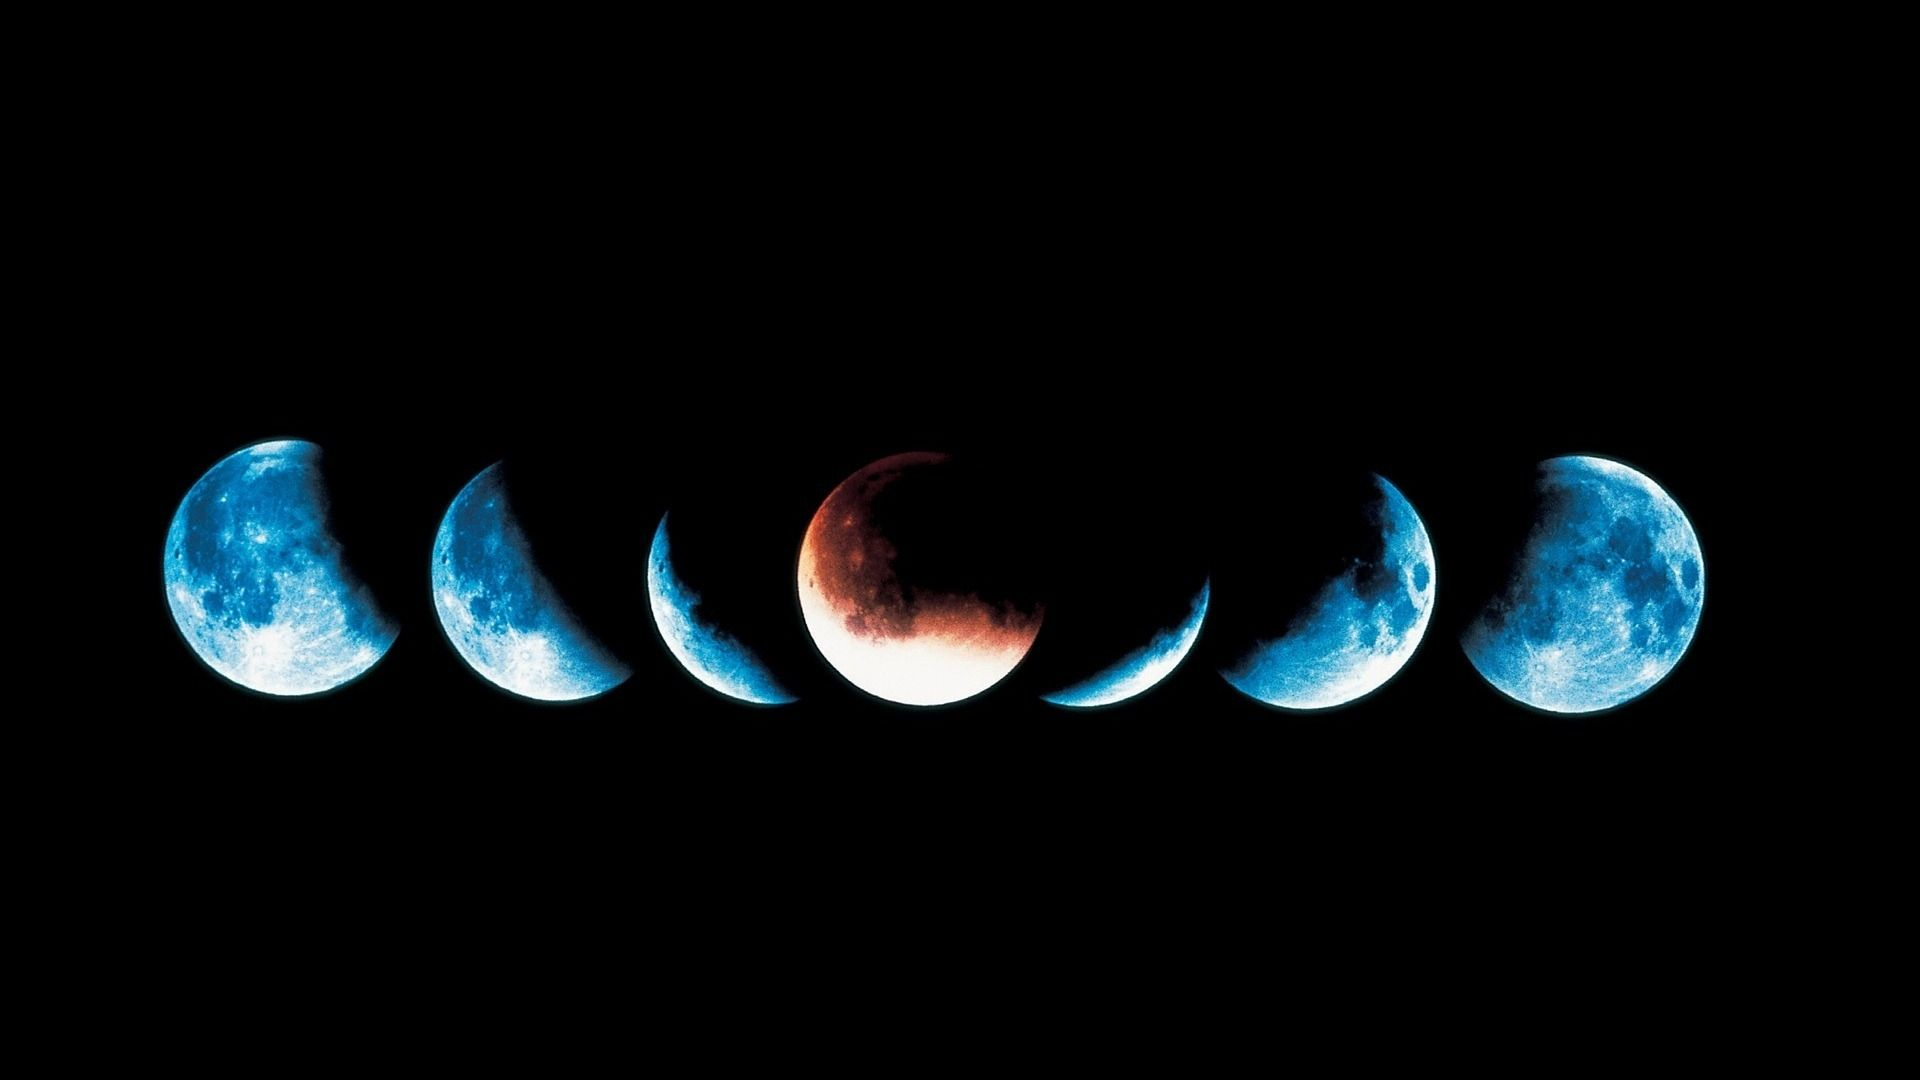 Phases Of The Moon Wallpaper Portadas Para Facebook Tumblr Portadas Para Facebook Fondos Para Pc Tumblr